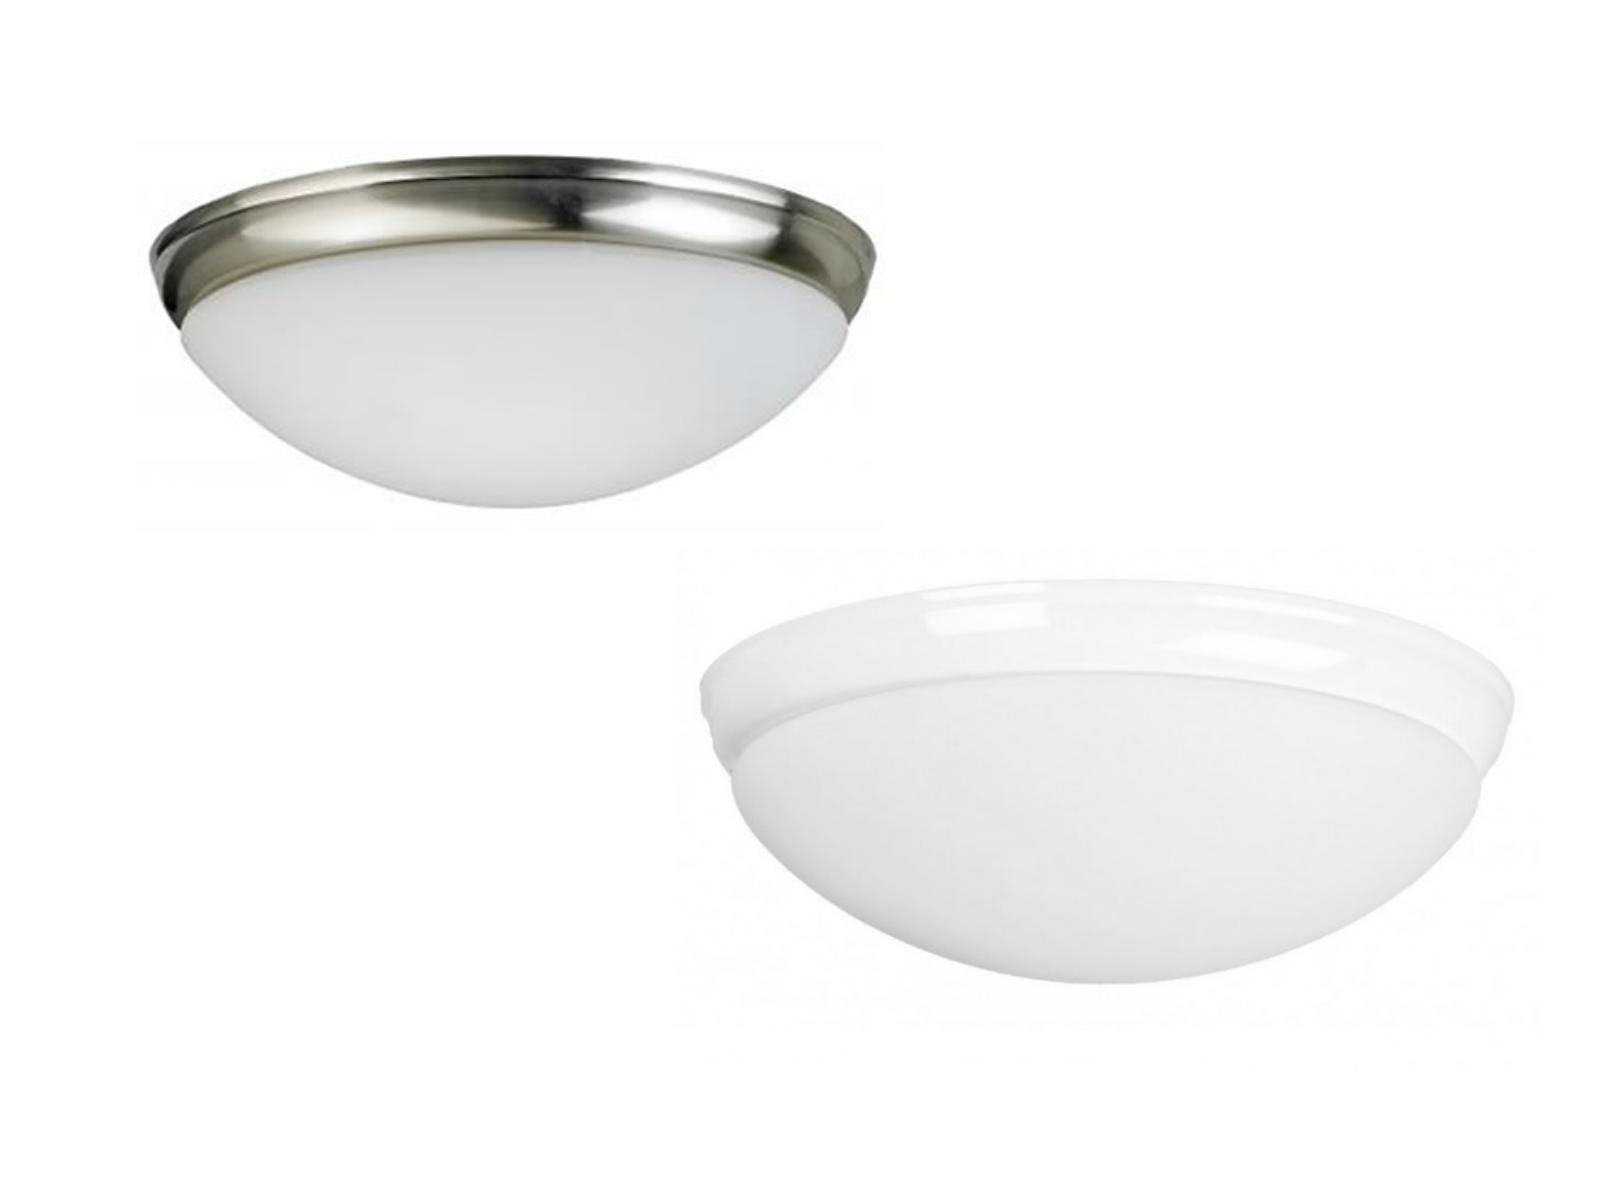 Fantasia Ceiling Fan Light Kit Aries